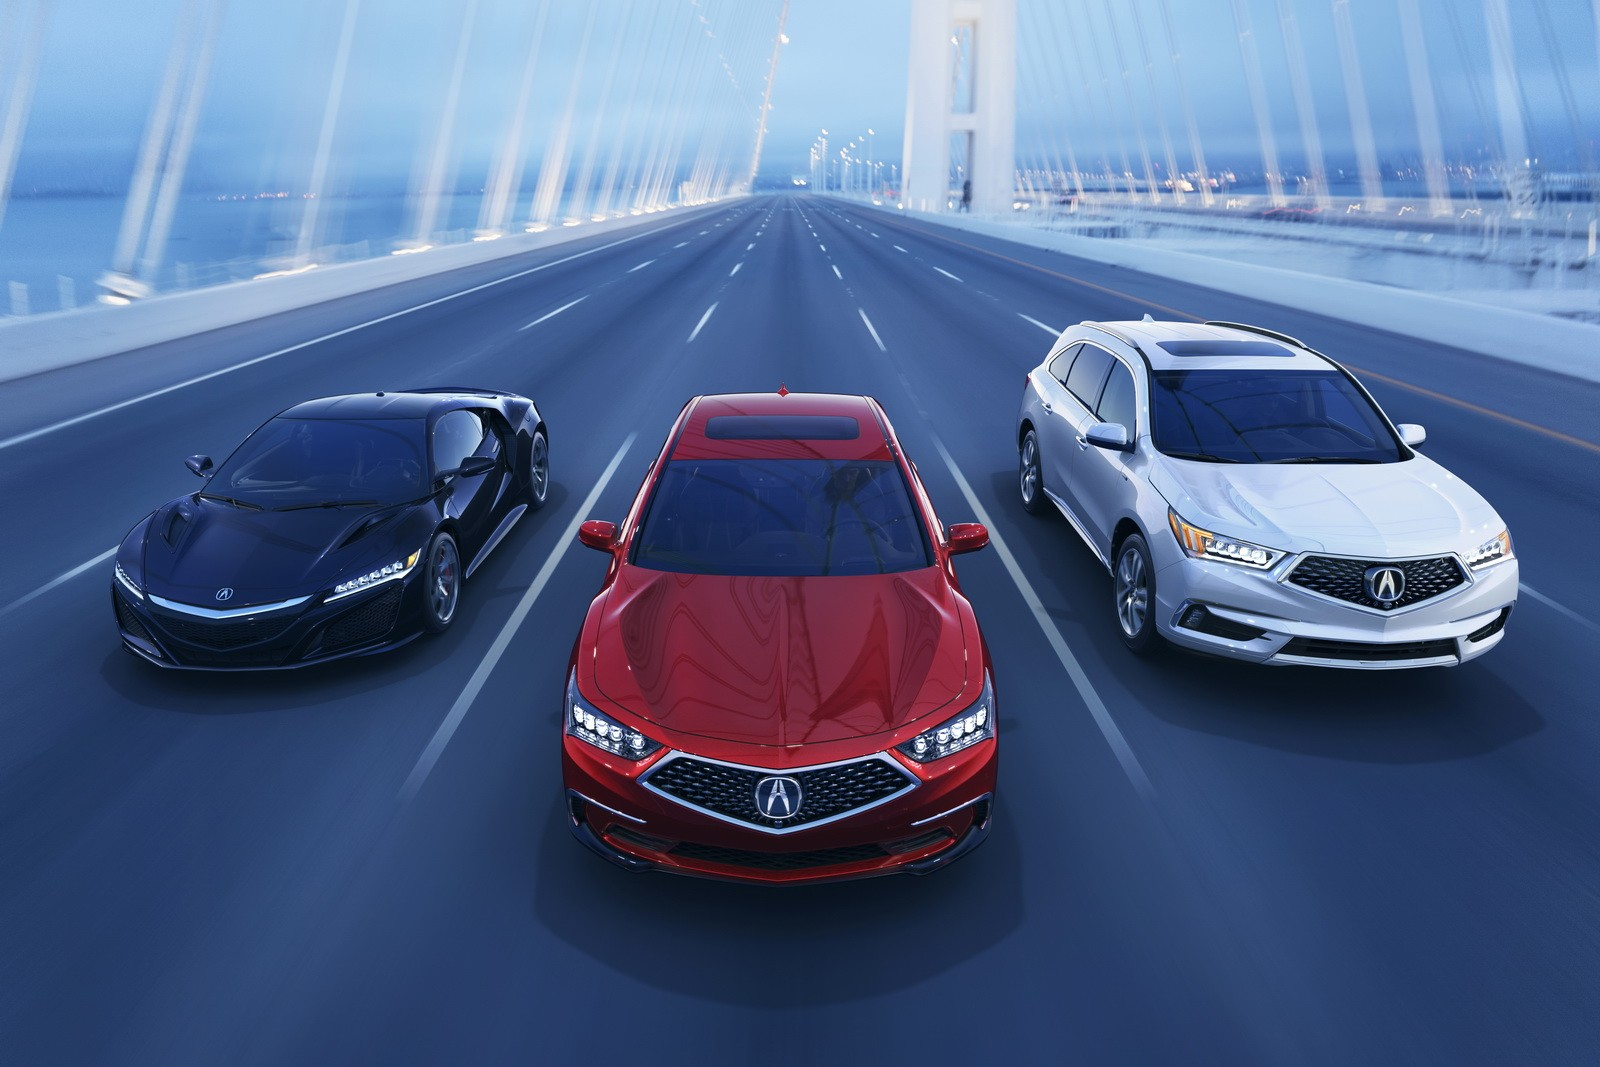 Mdx Sport Hybrid >> 2018 Acura RLX Adds Fresh Styling, 10-Speed Automatic Transmission - autoevolution